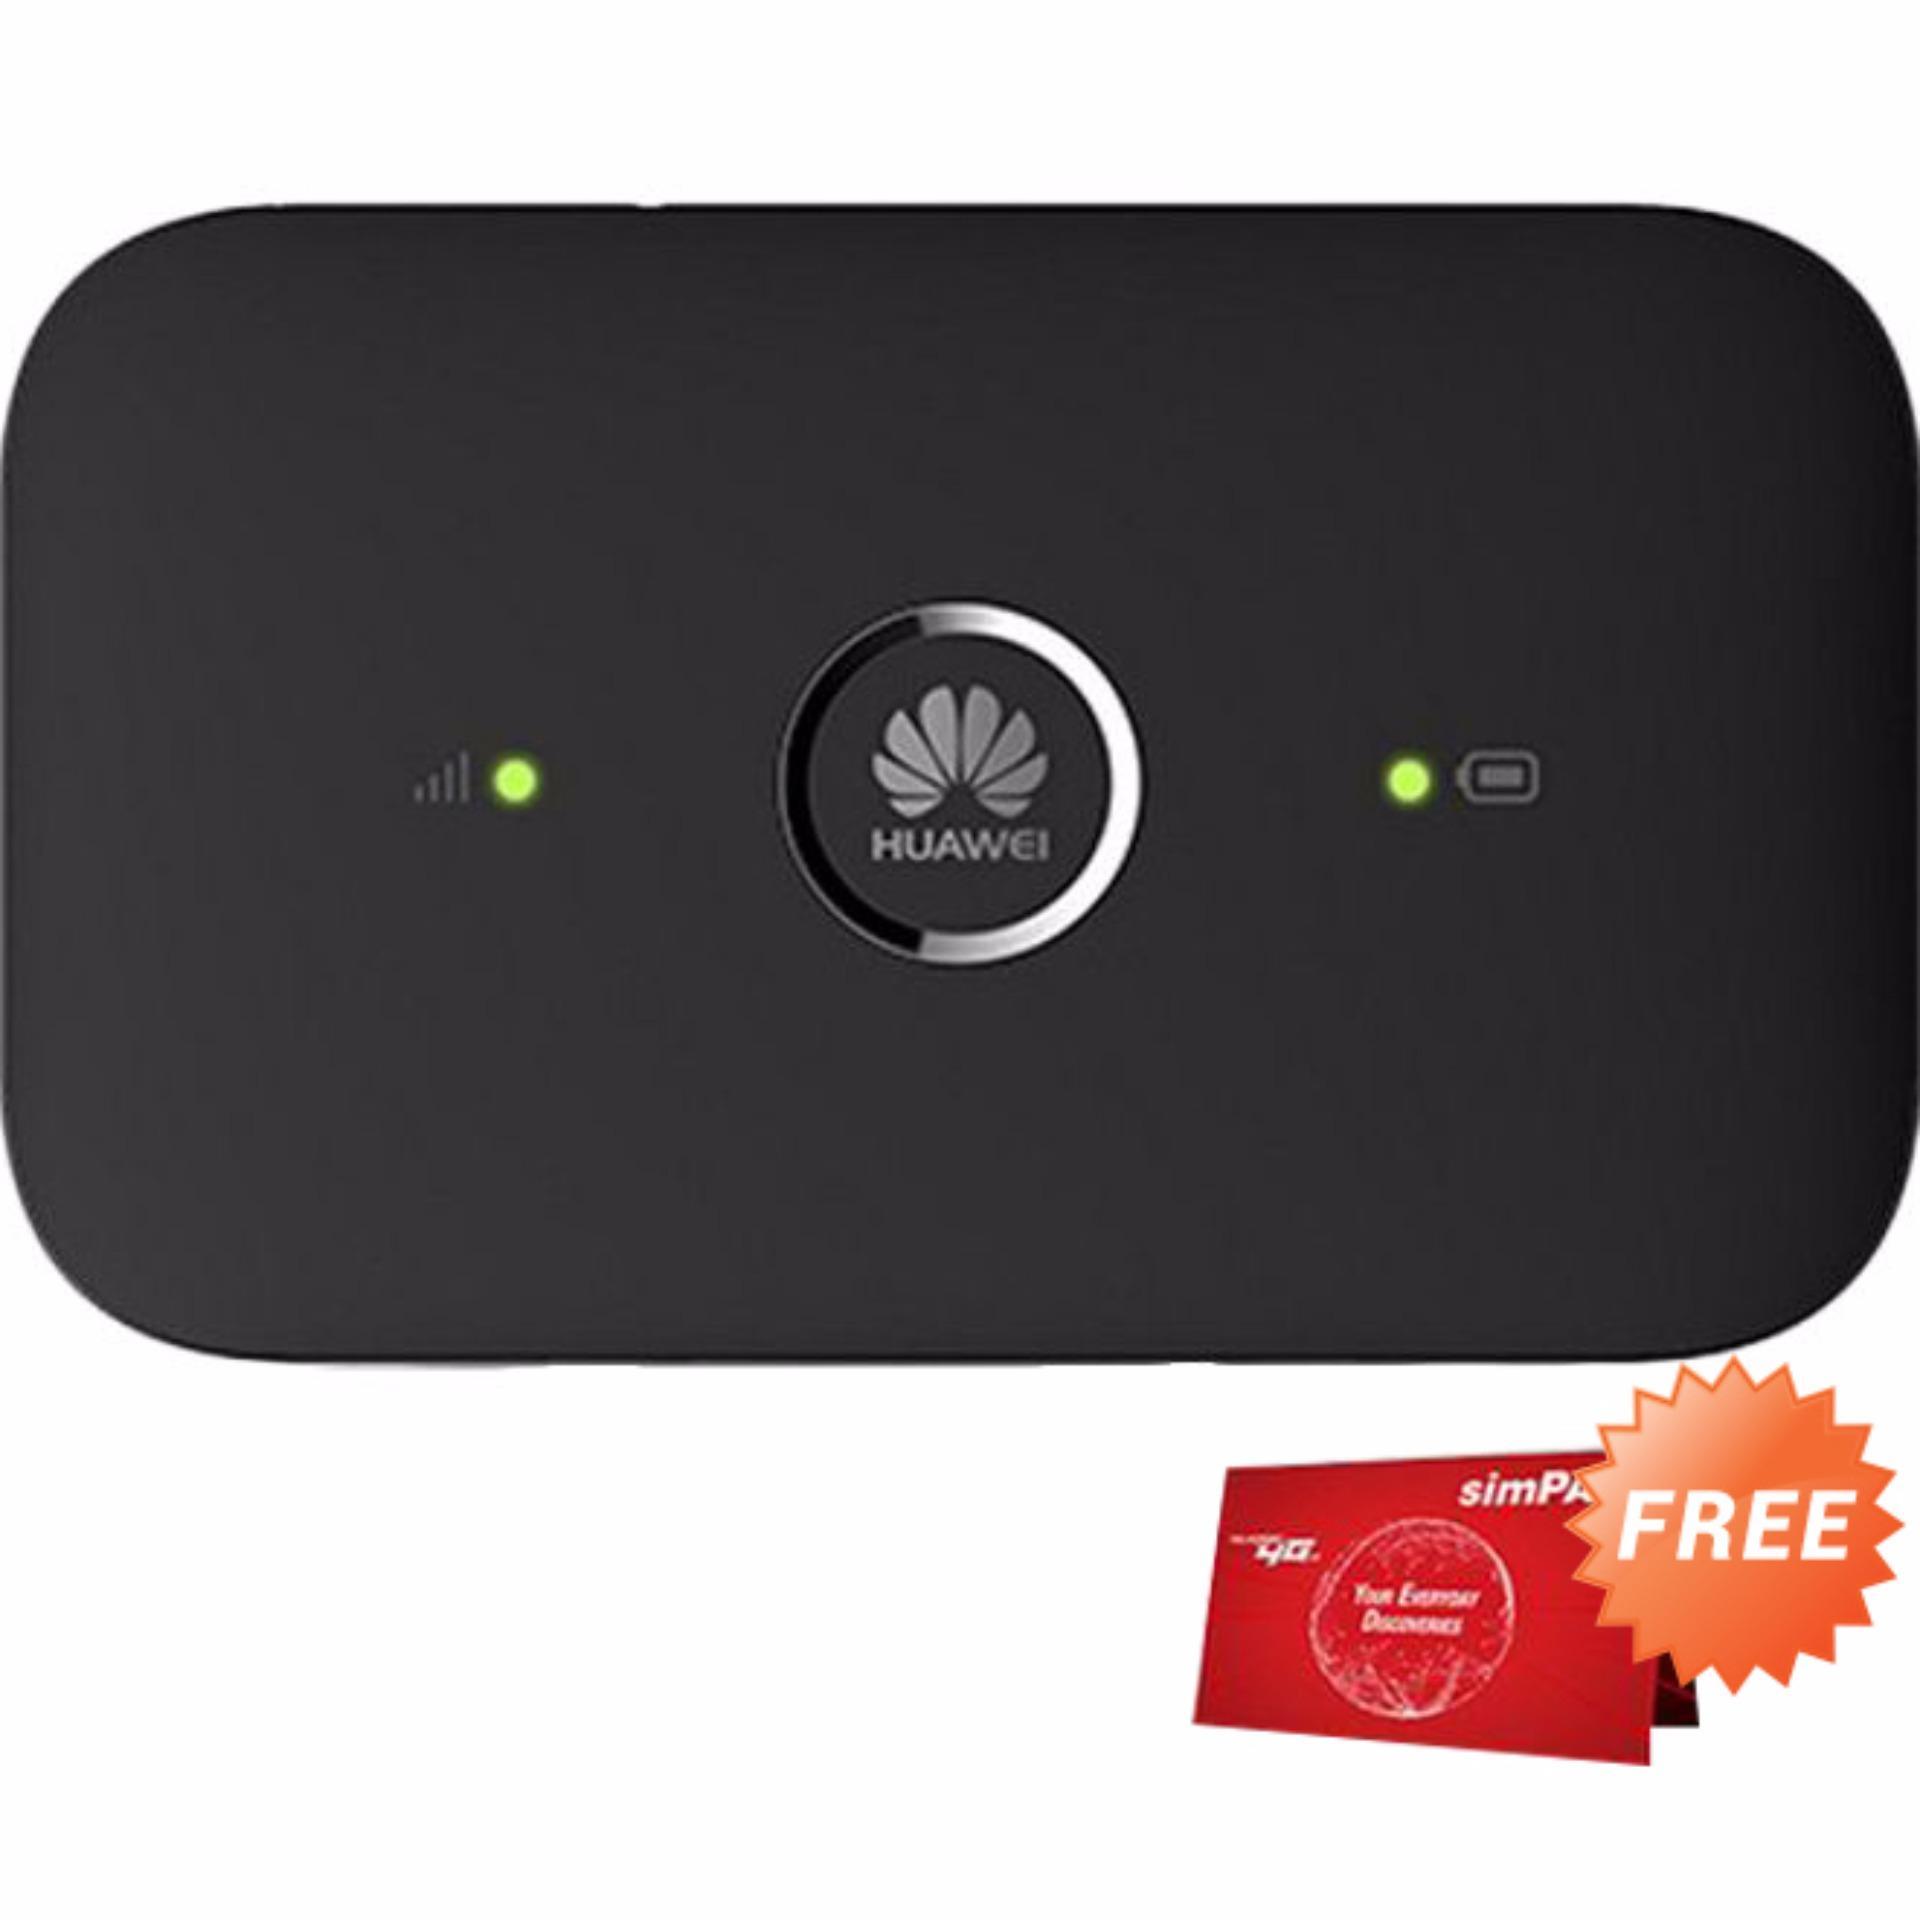 Huawei Modem Wifi Mifi E5573 Unlocked 4g All Gsm Free Telkomsel 14gb Pahe 3 Plus Paket Tambahan